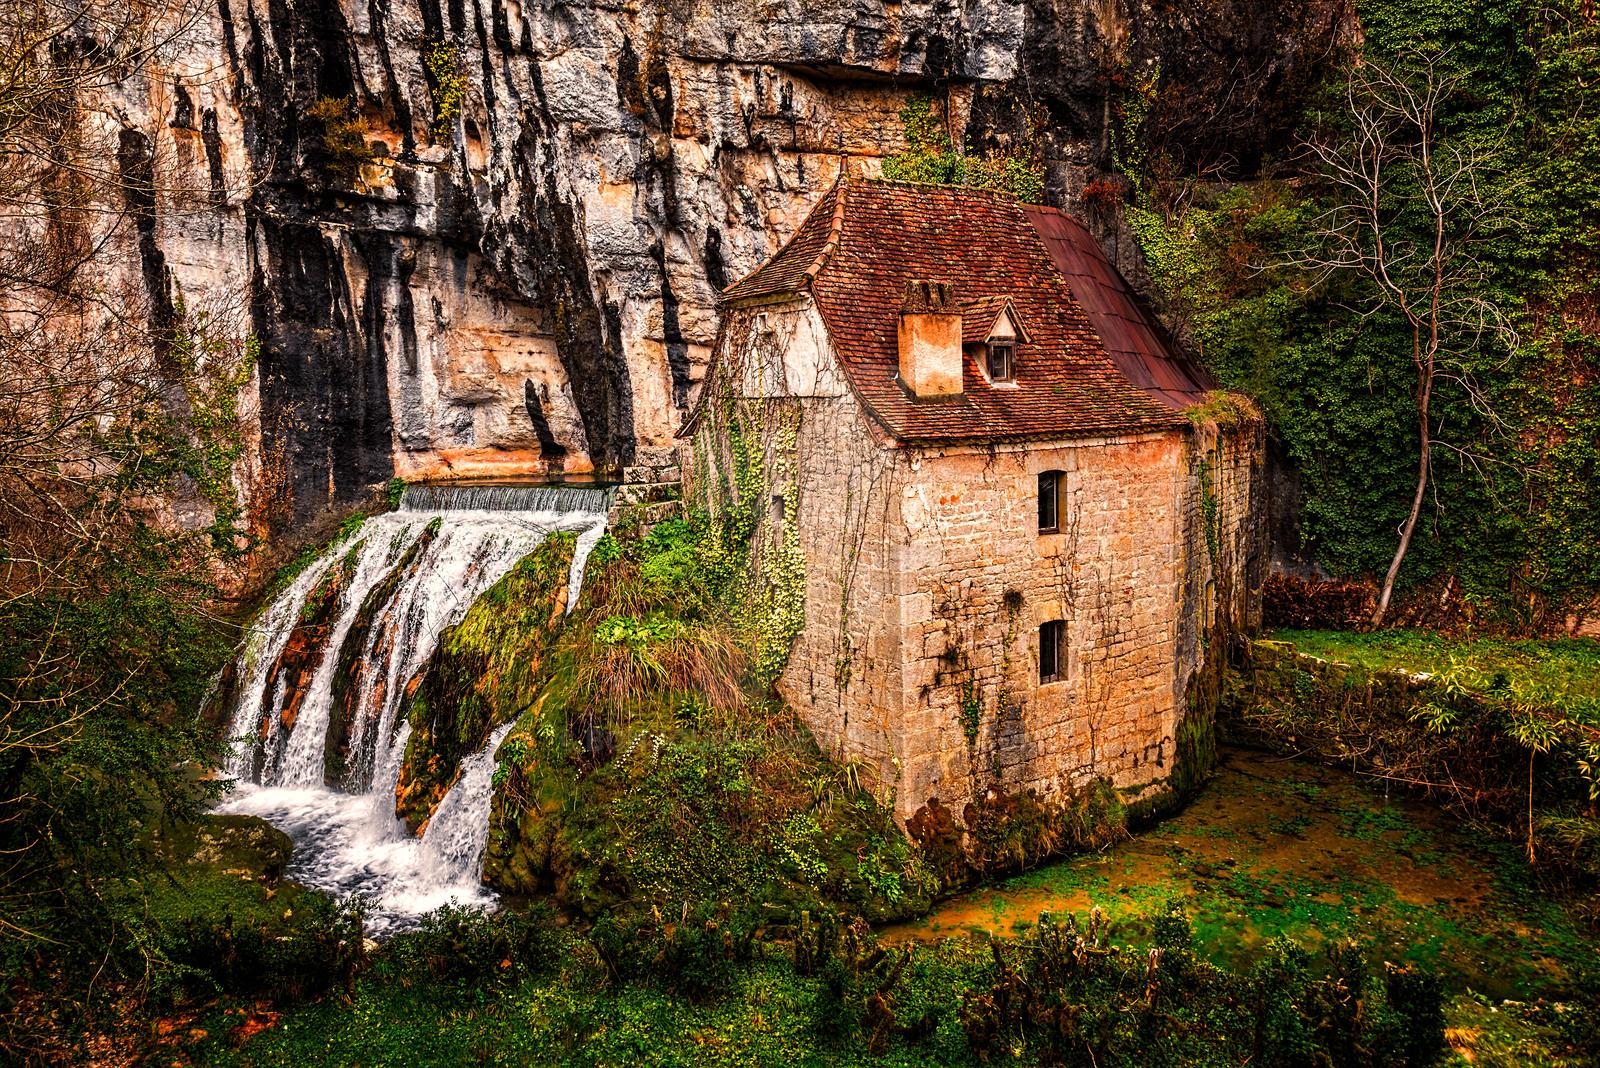 Moulin de Pescaliere by Bonjour46